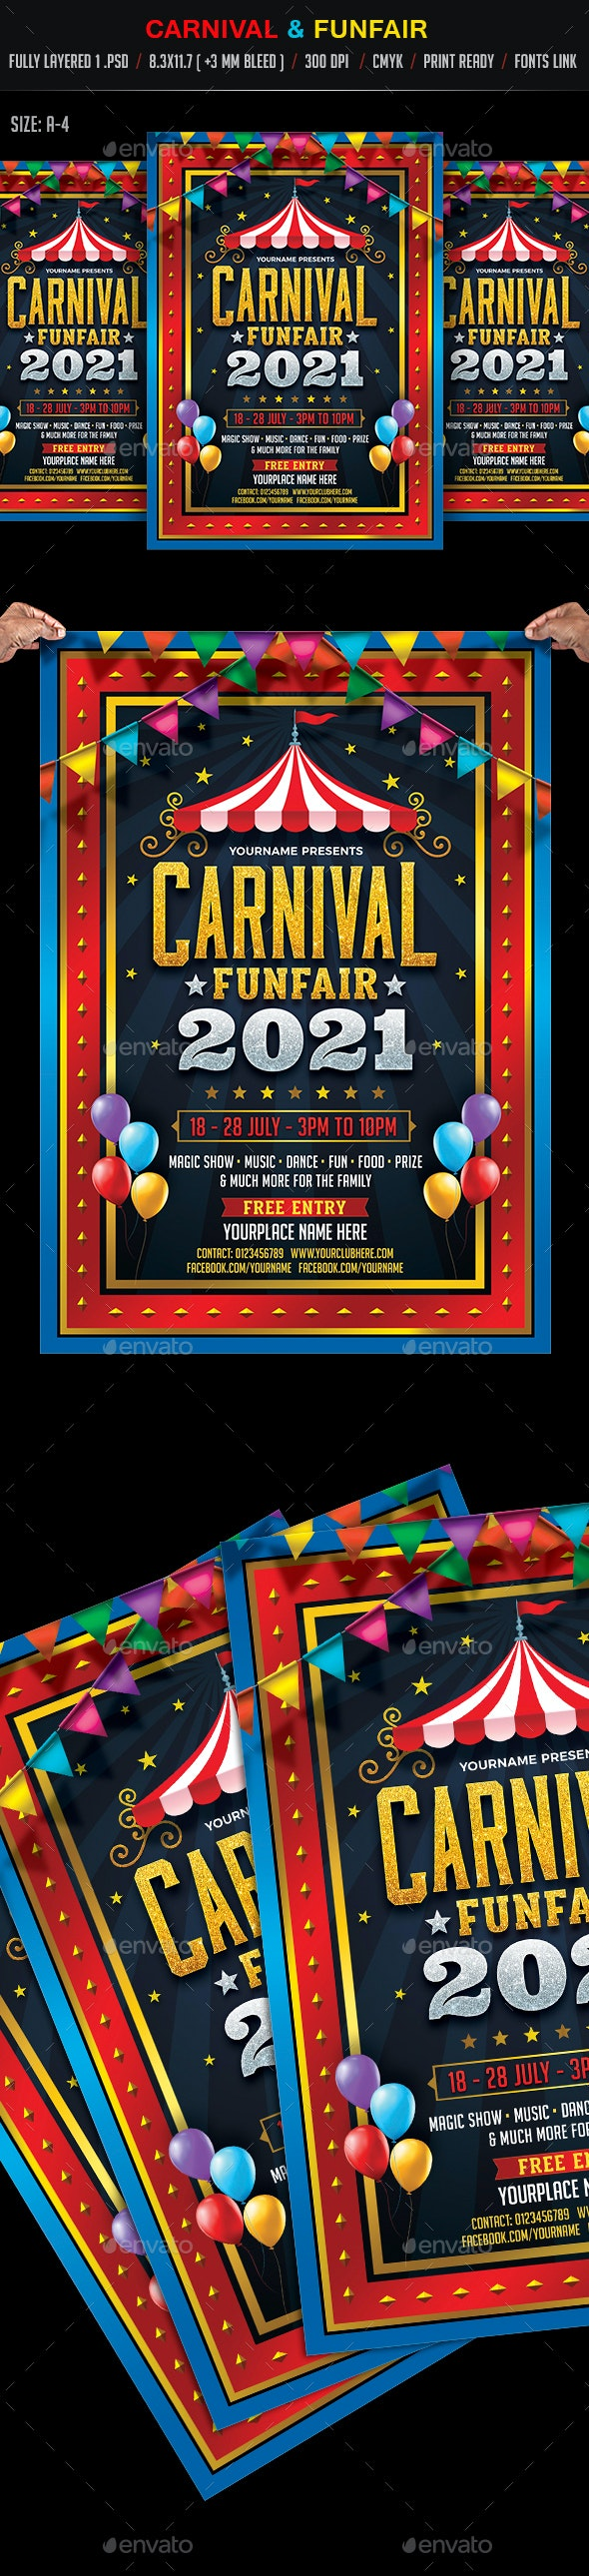 Carnival & Funfair Flyer - Events Flyers